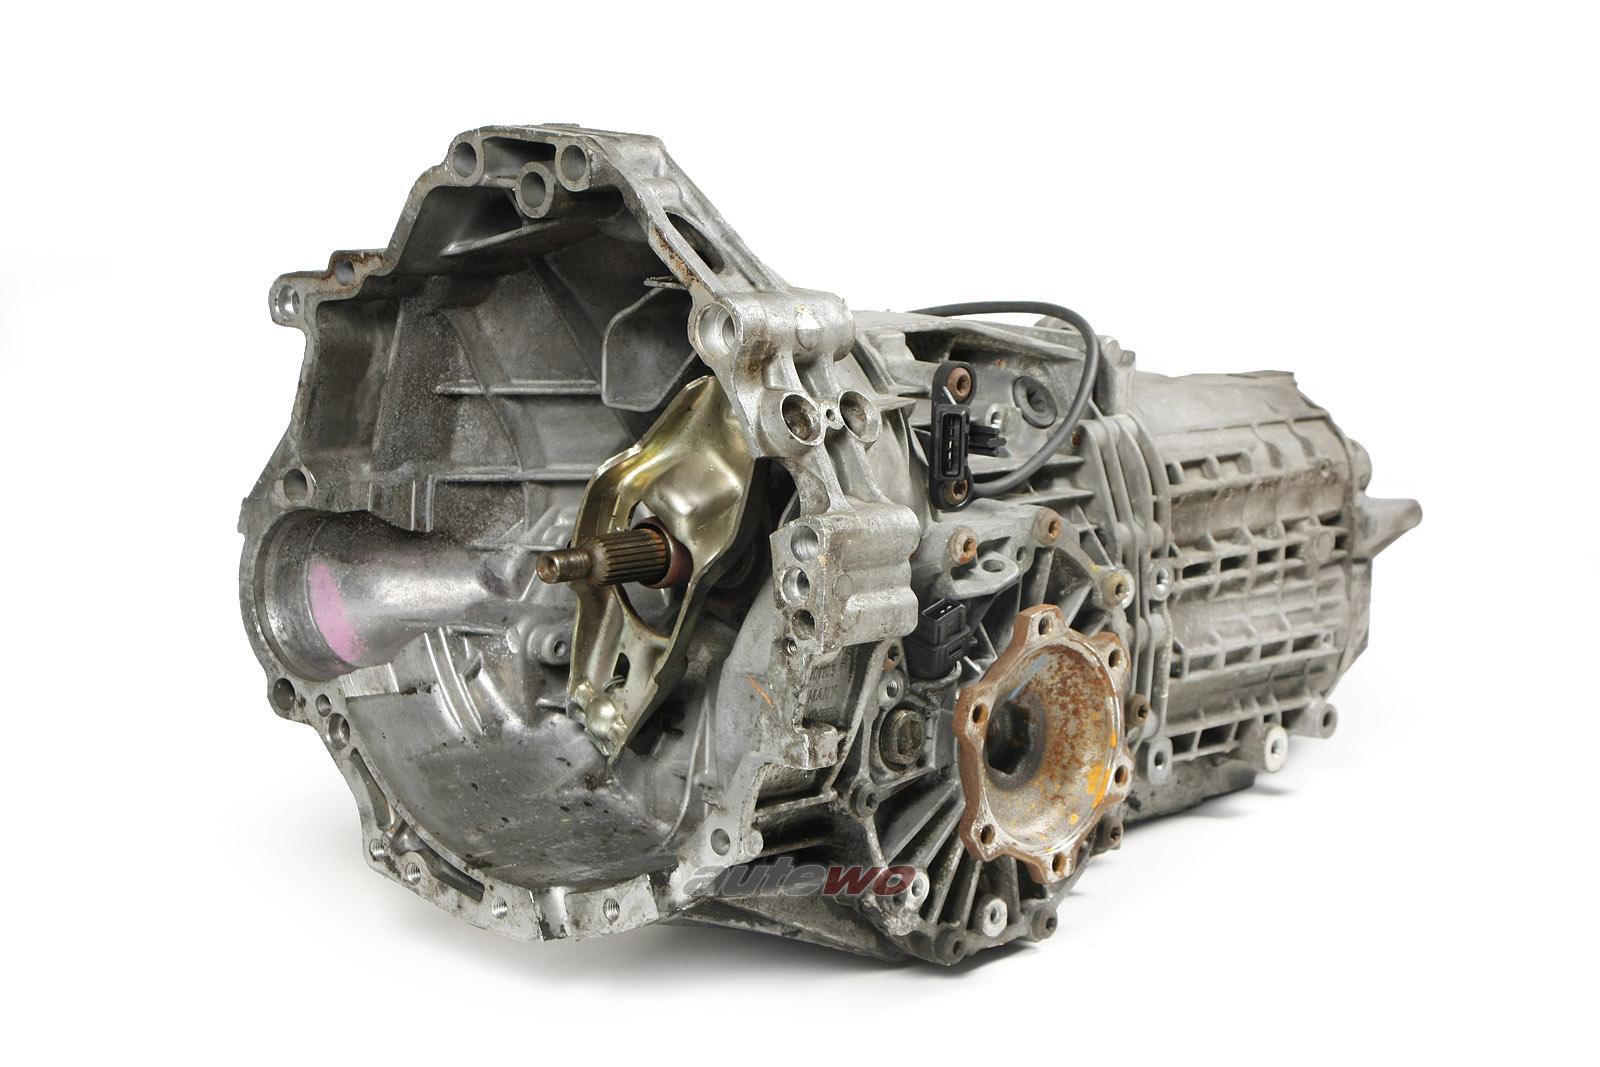 012300054 X Audi 80 Typ 89 Cabrio/A6 C4 2.6l Getriebe 5-Gang DVT 15039